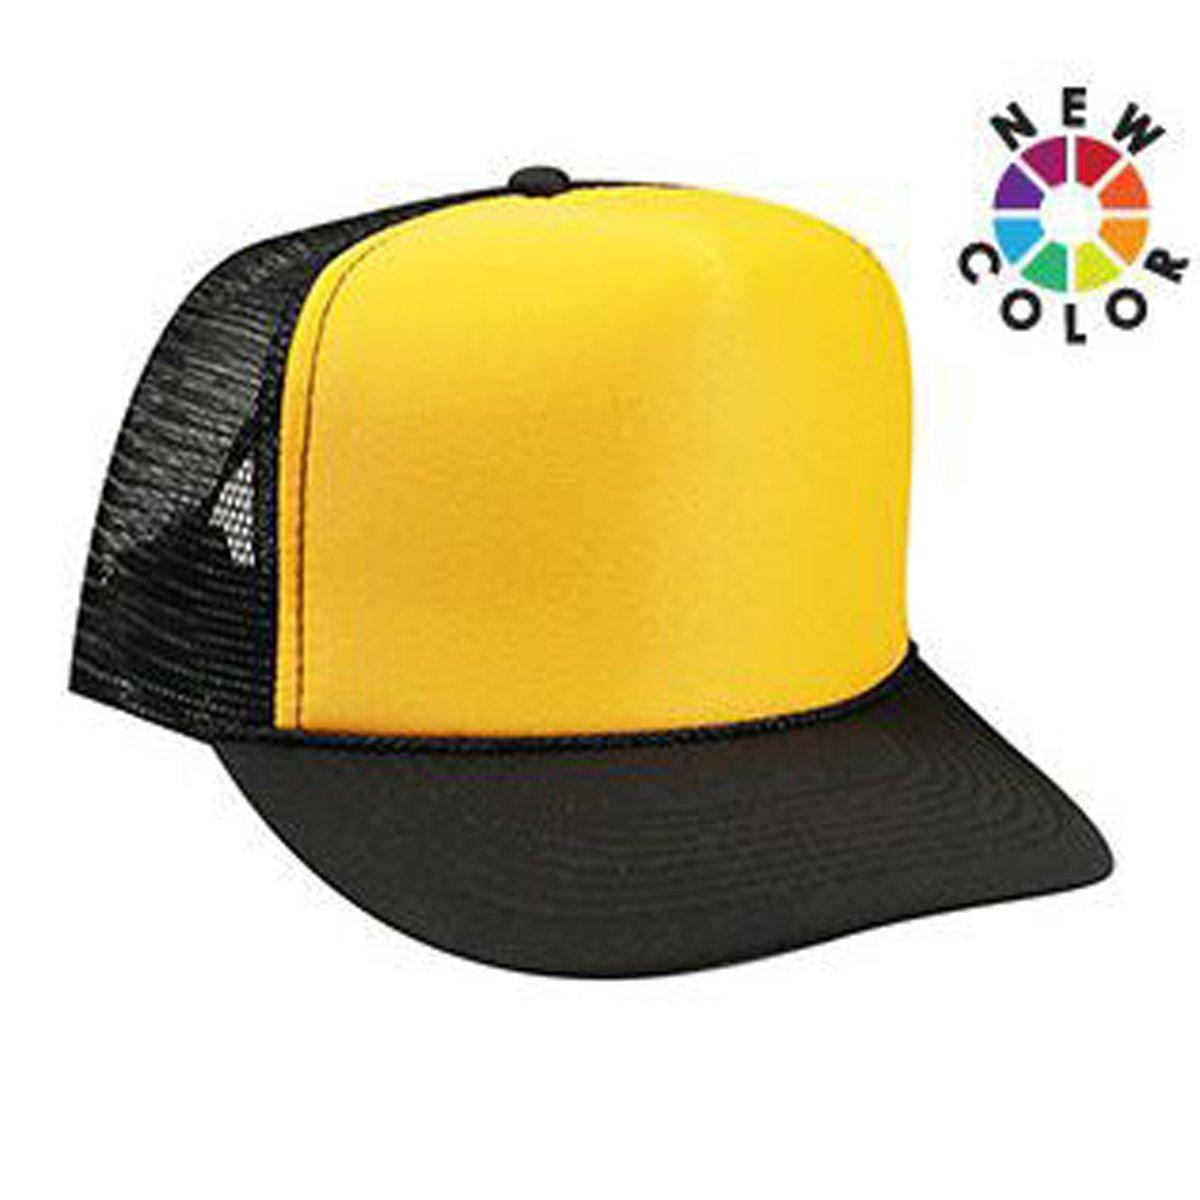 Product of Ottocap Polyester Foam Front Five Panel High Crown Mesh Back Trucker  Hat -Blk Gld Blk  Wholesale Price on Bulk  at Amazon Men s Clothing store  3d92de62544